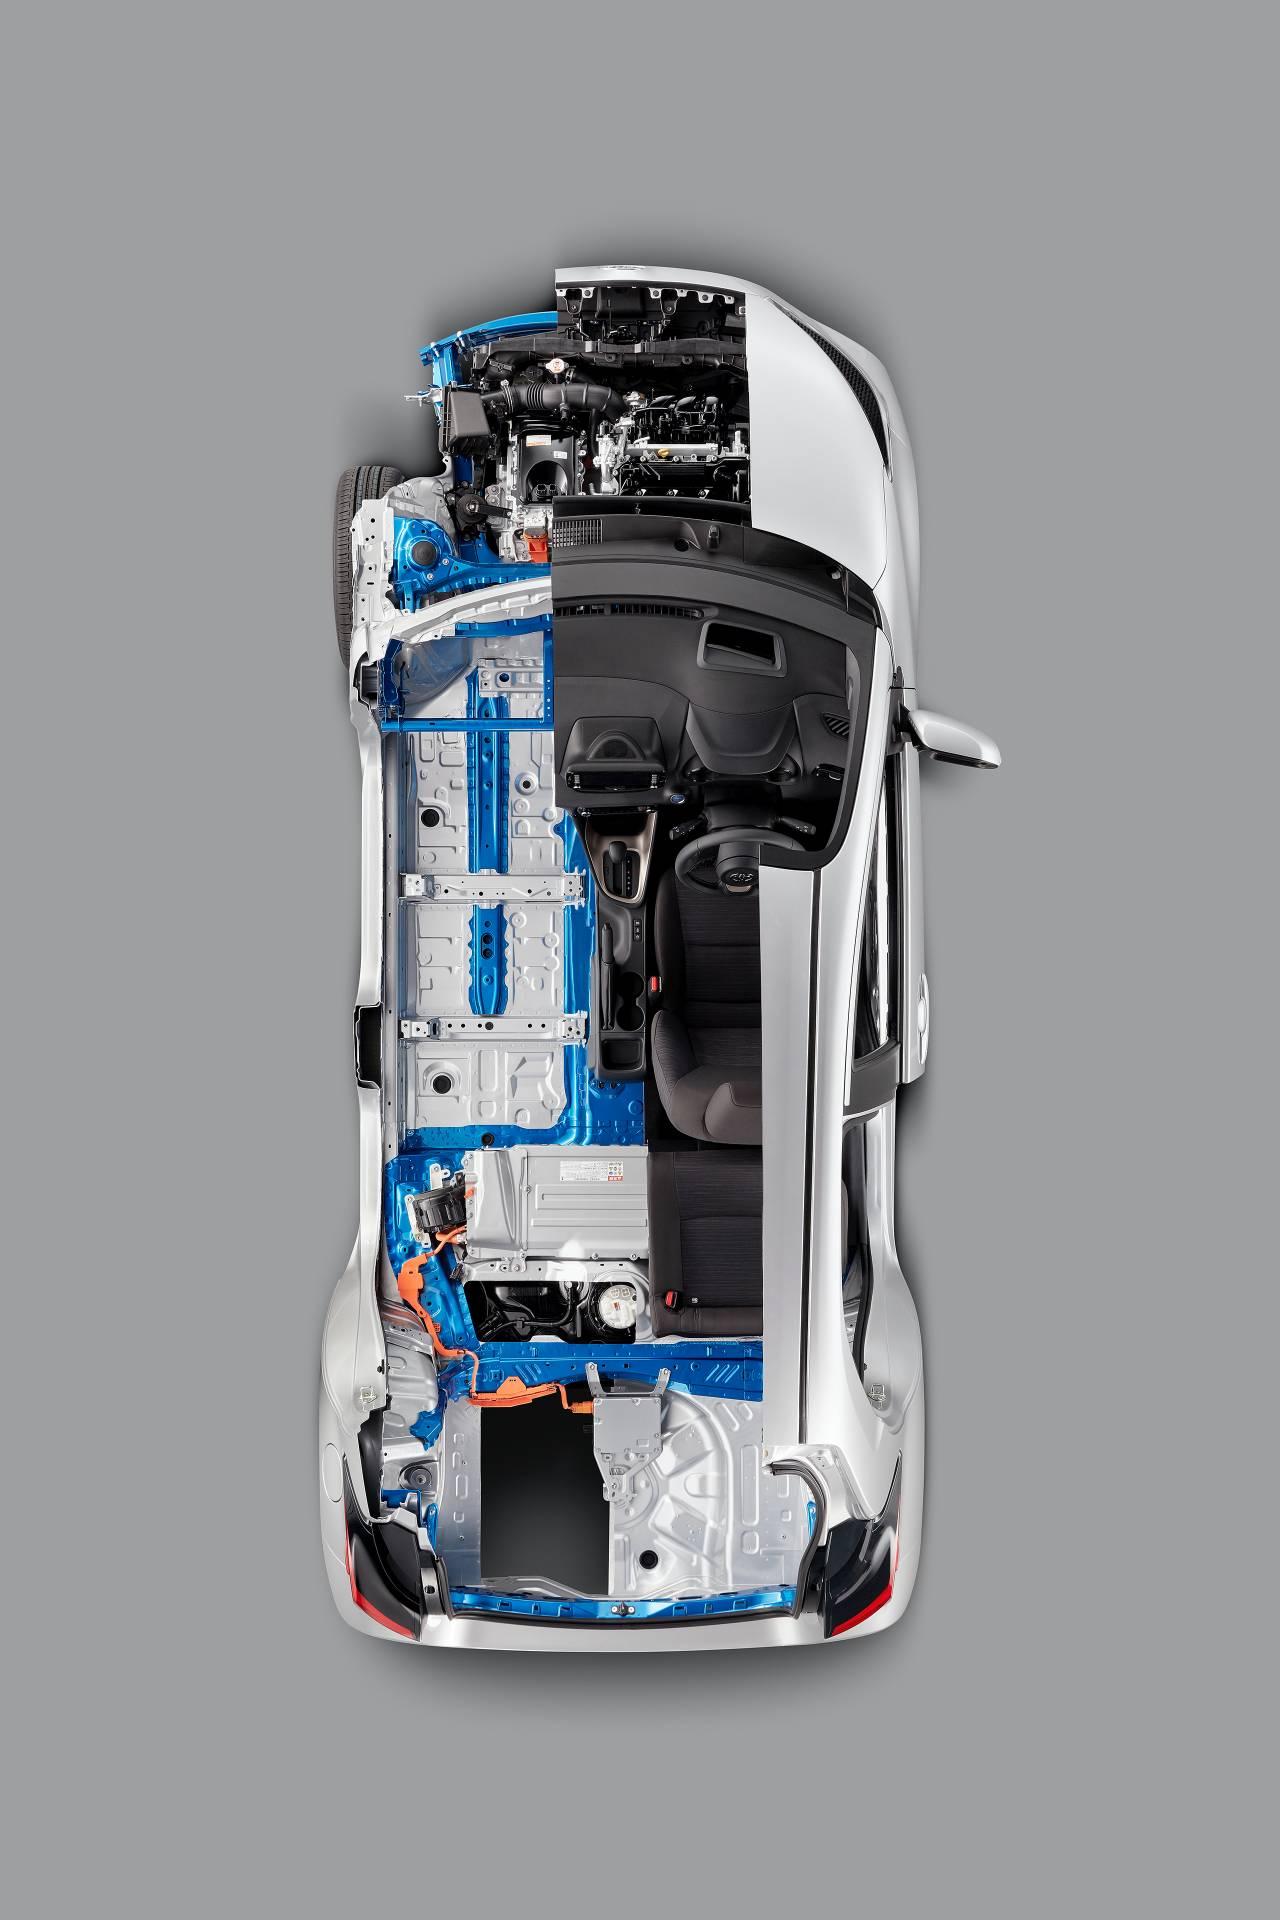 Toyota-Yaris-2020-76